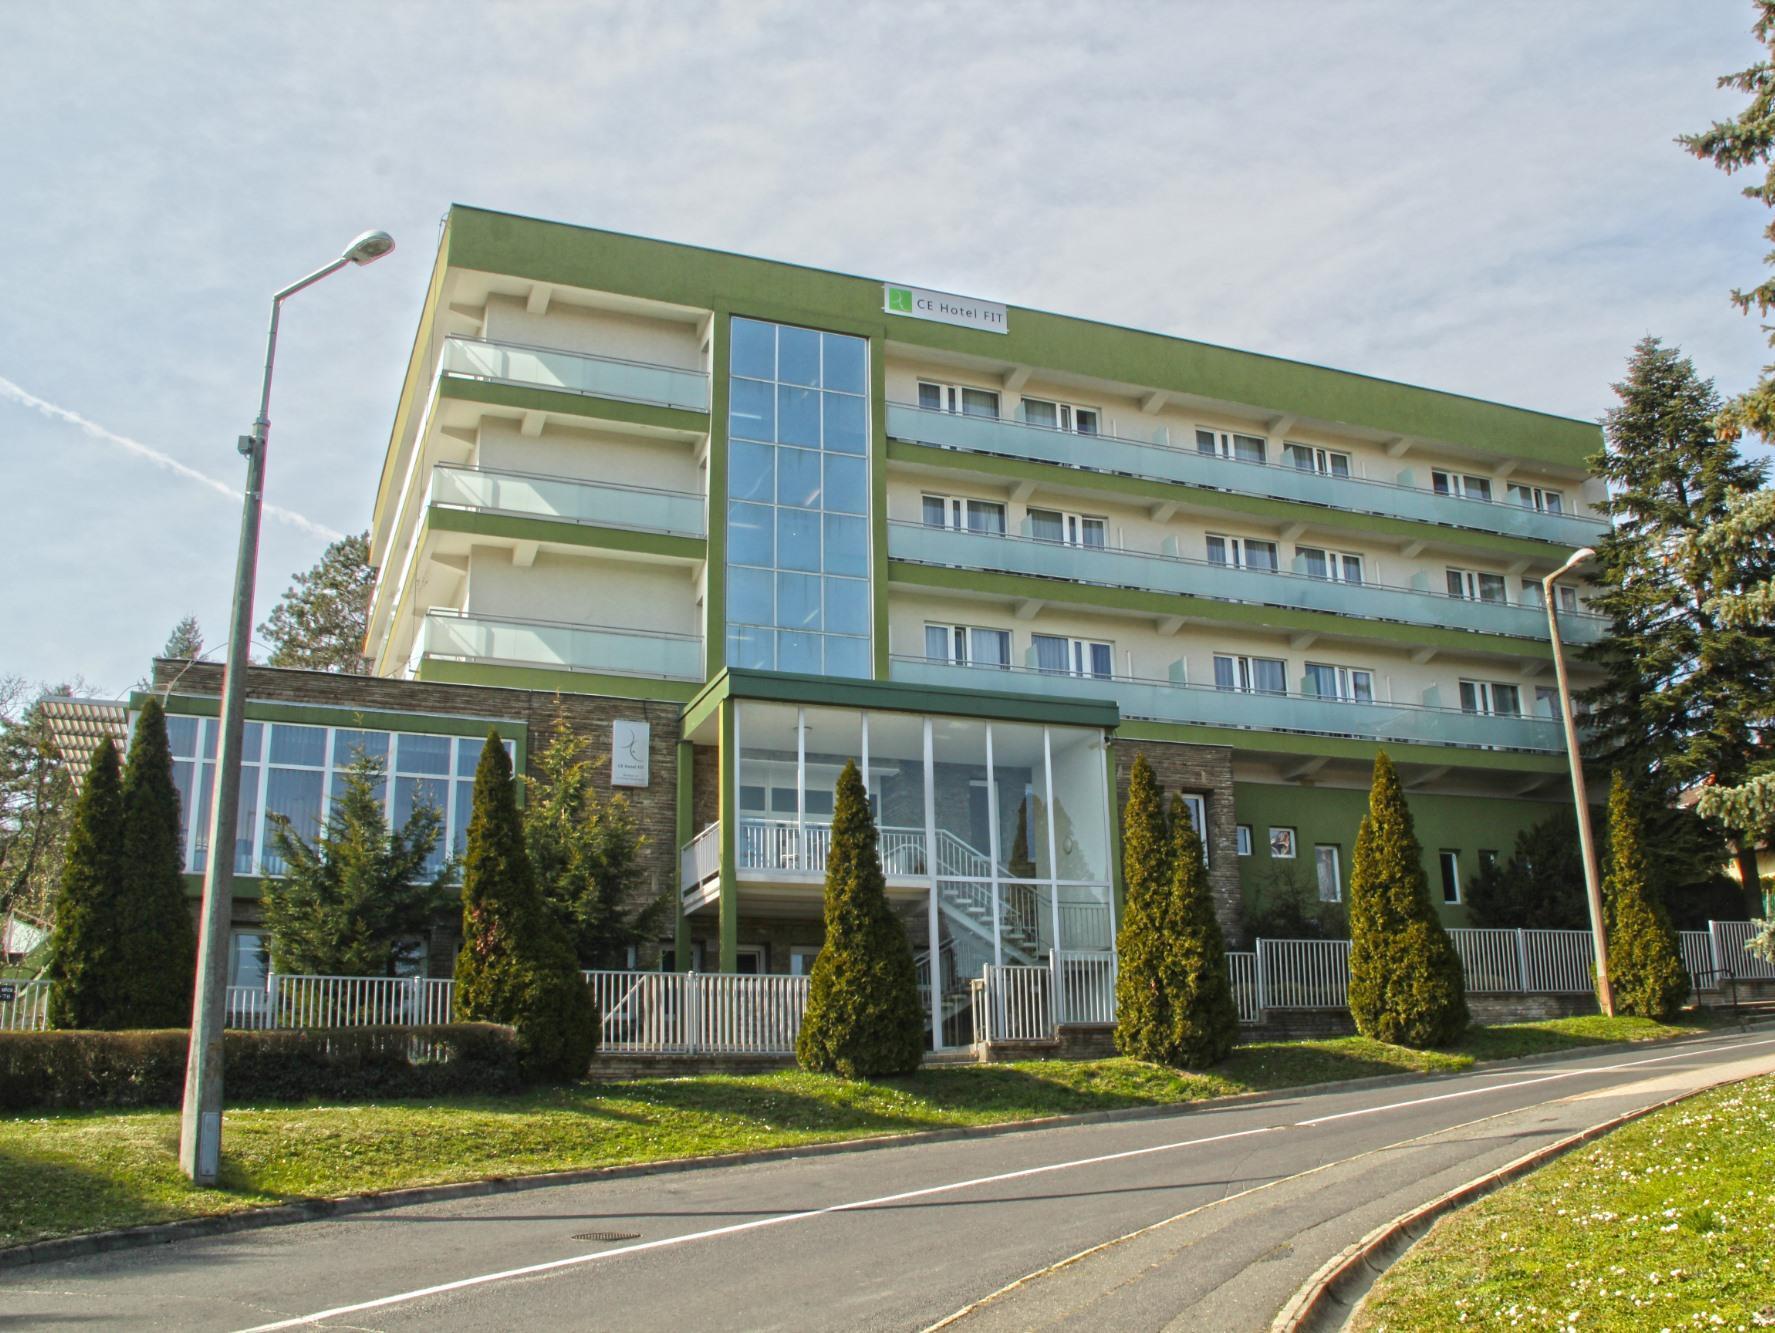 CE Quelle Hotel